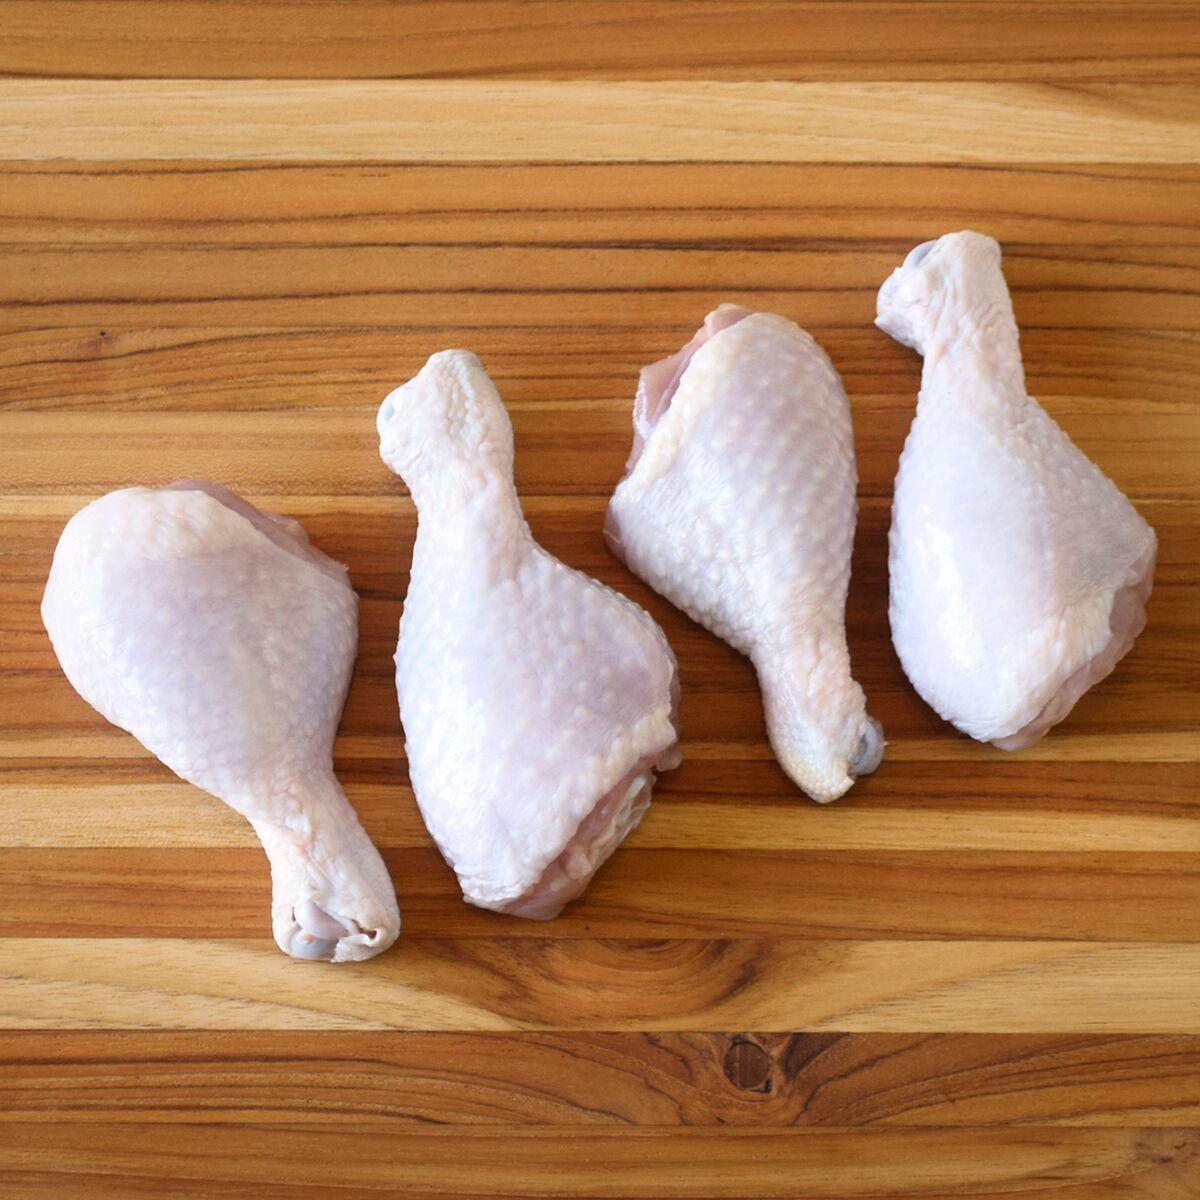 D'Artagnan Organic Chicken Drumsticks: Fresh (9lb case 9 1lb avg packs avg. each)  by D'Artagnan